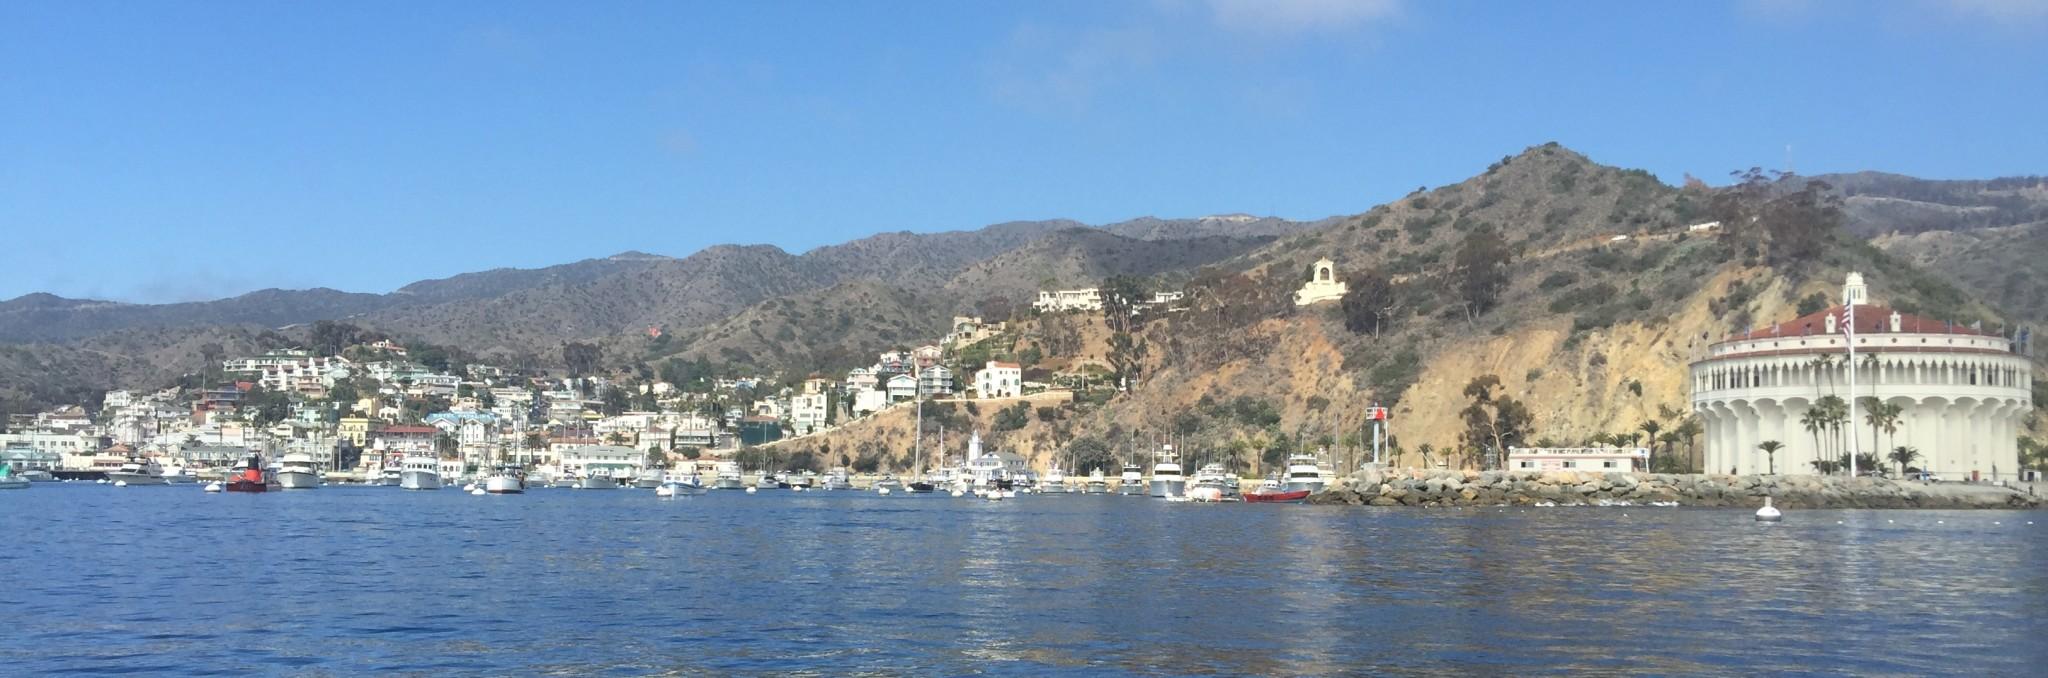 Catalina island getaways southern california fishing for Catalina island fishing charters